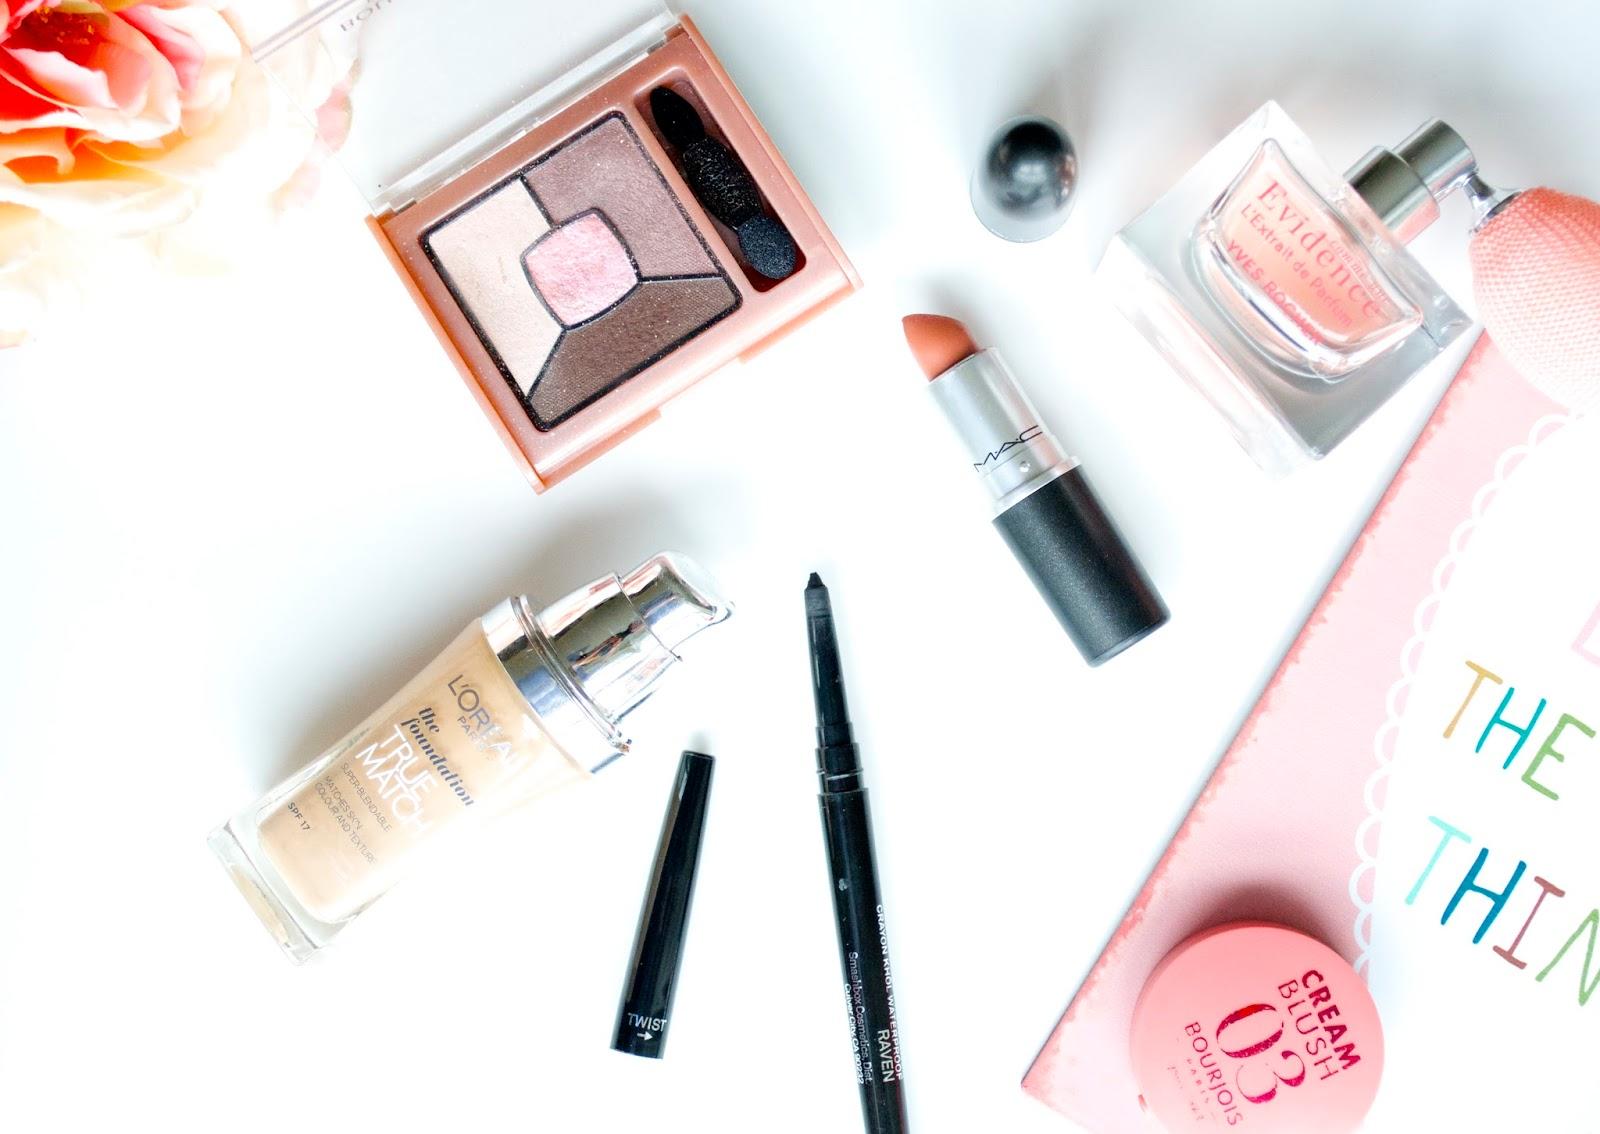 The Spring Essentials - My Top Beauty Picks, Bourjois, Smashbox, Mac Honeylove, L'Oreal True Match, Yves Rocher